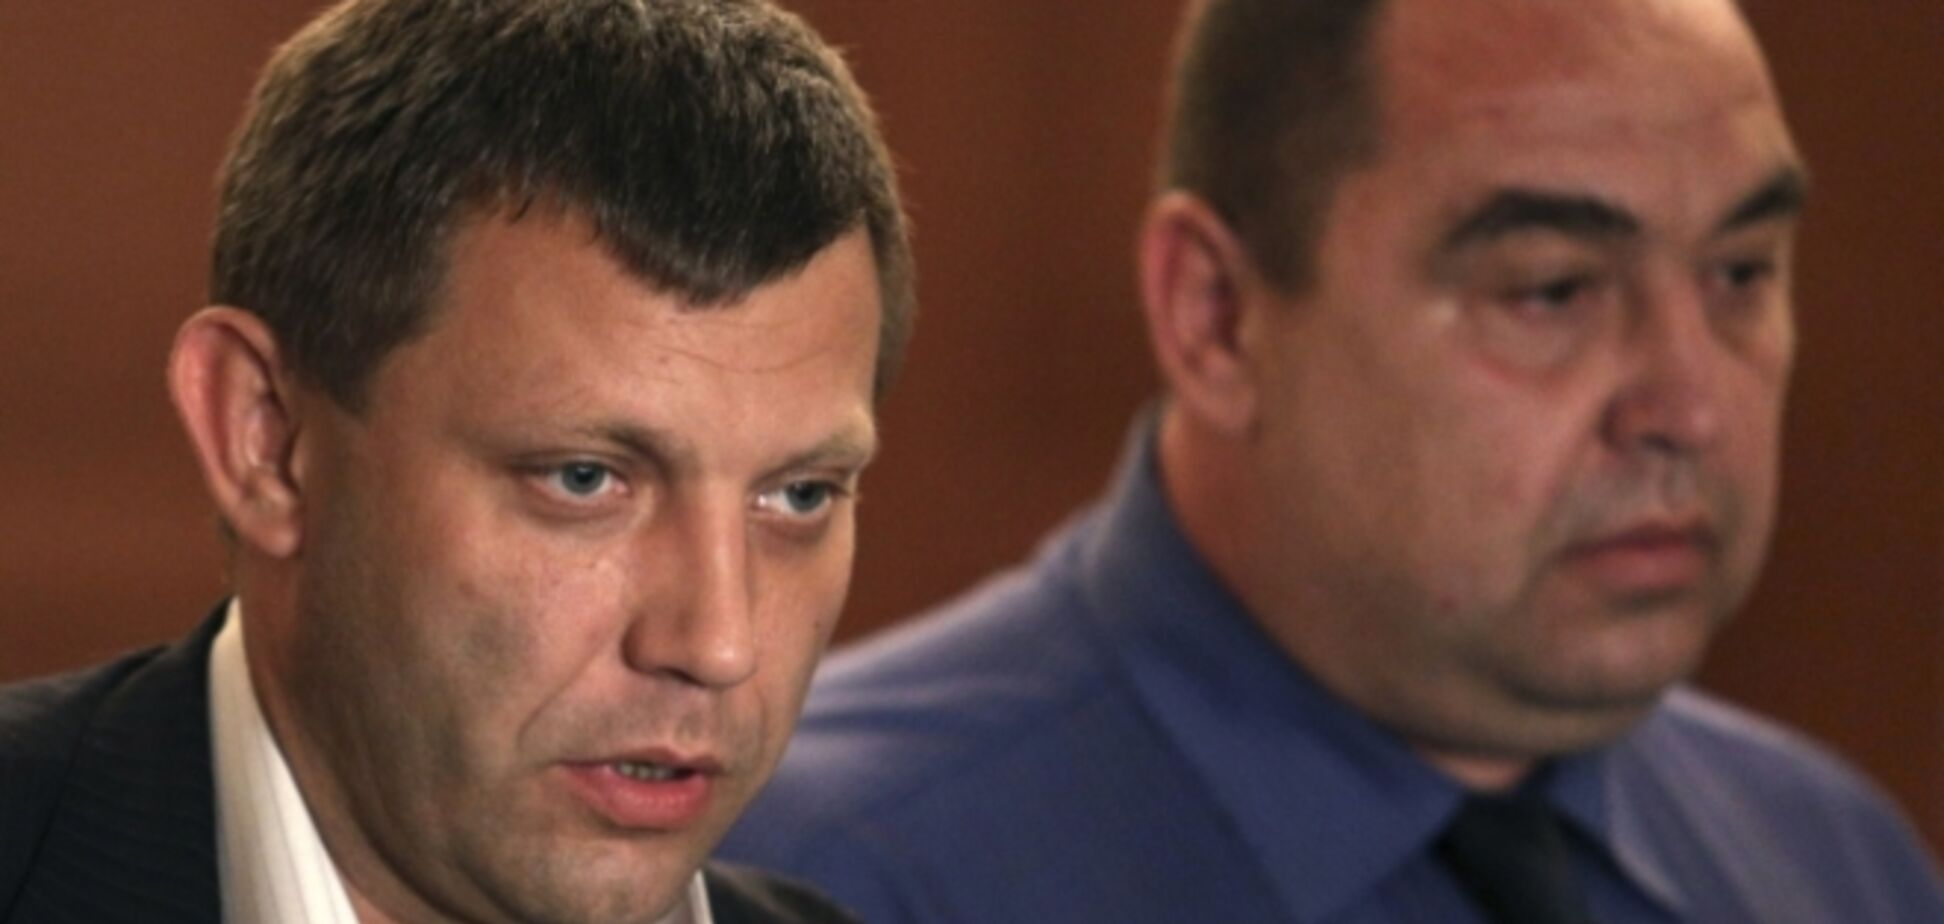 'ДНР' и 'ЛНР' заявили о 'верности' Минскому меморандуму